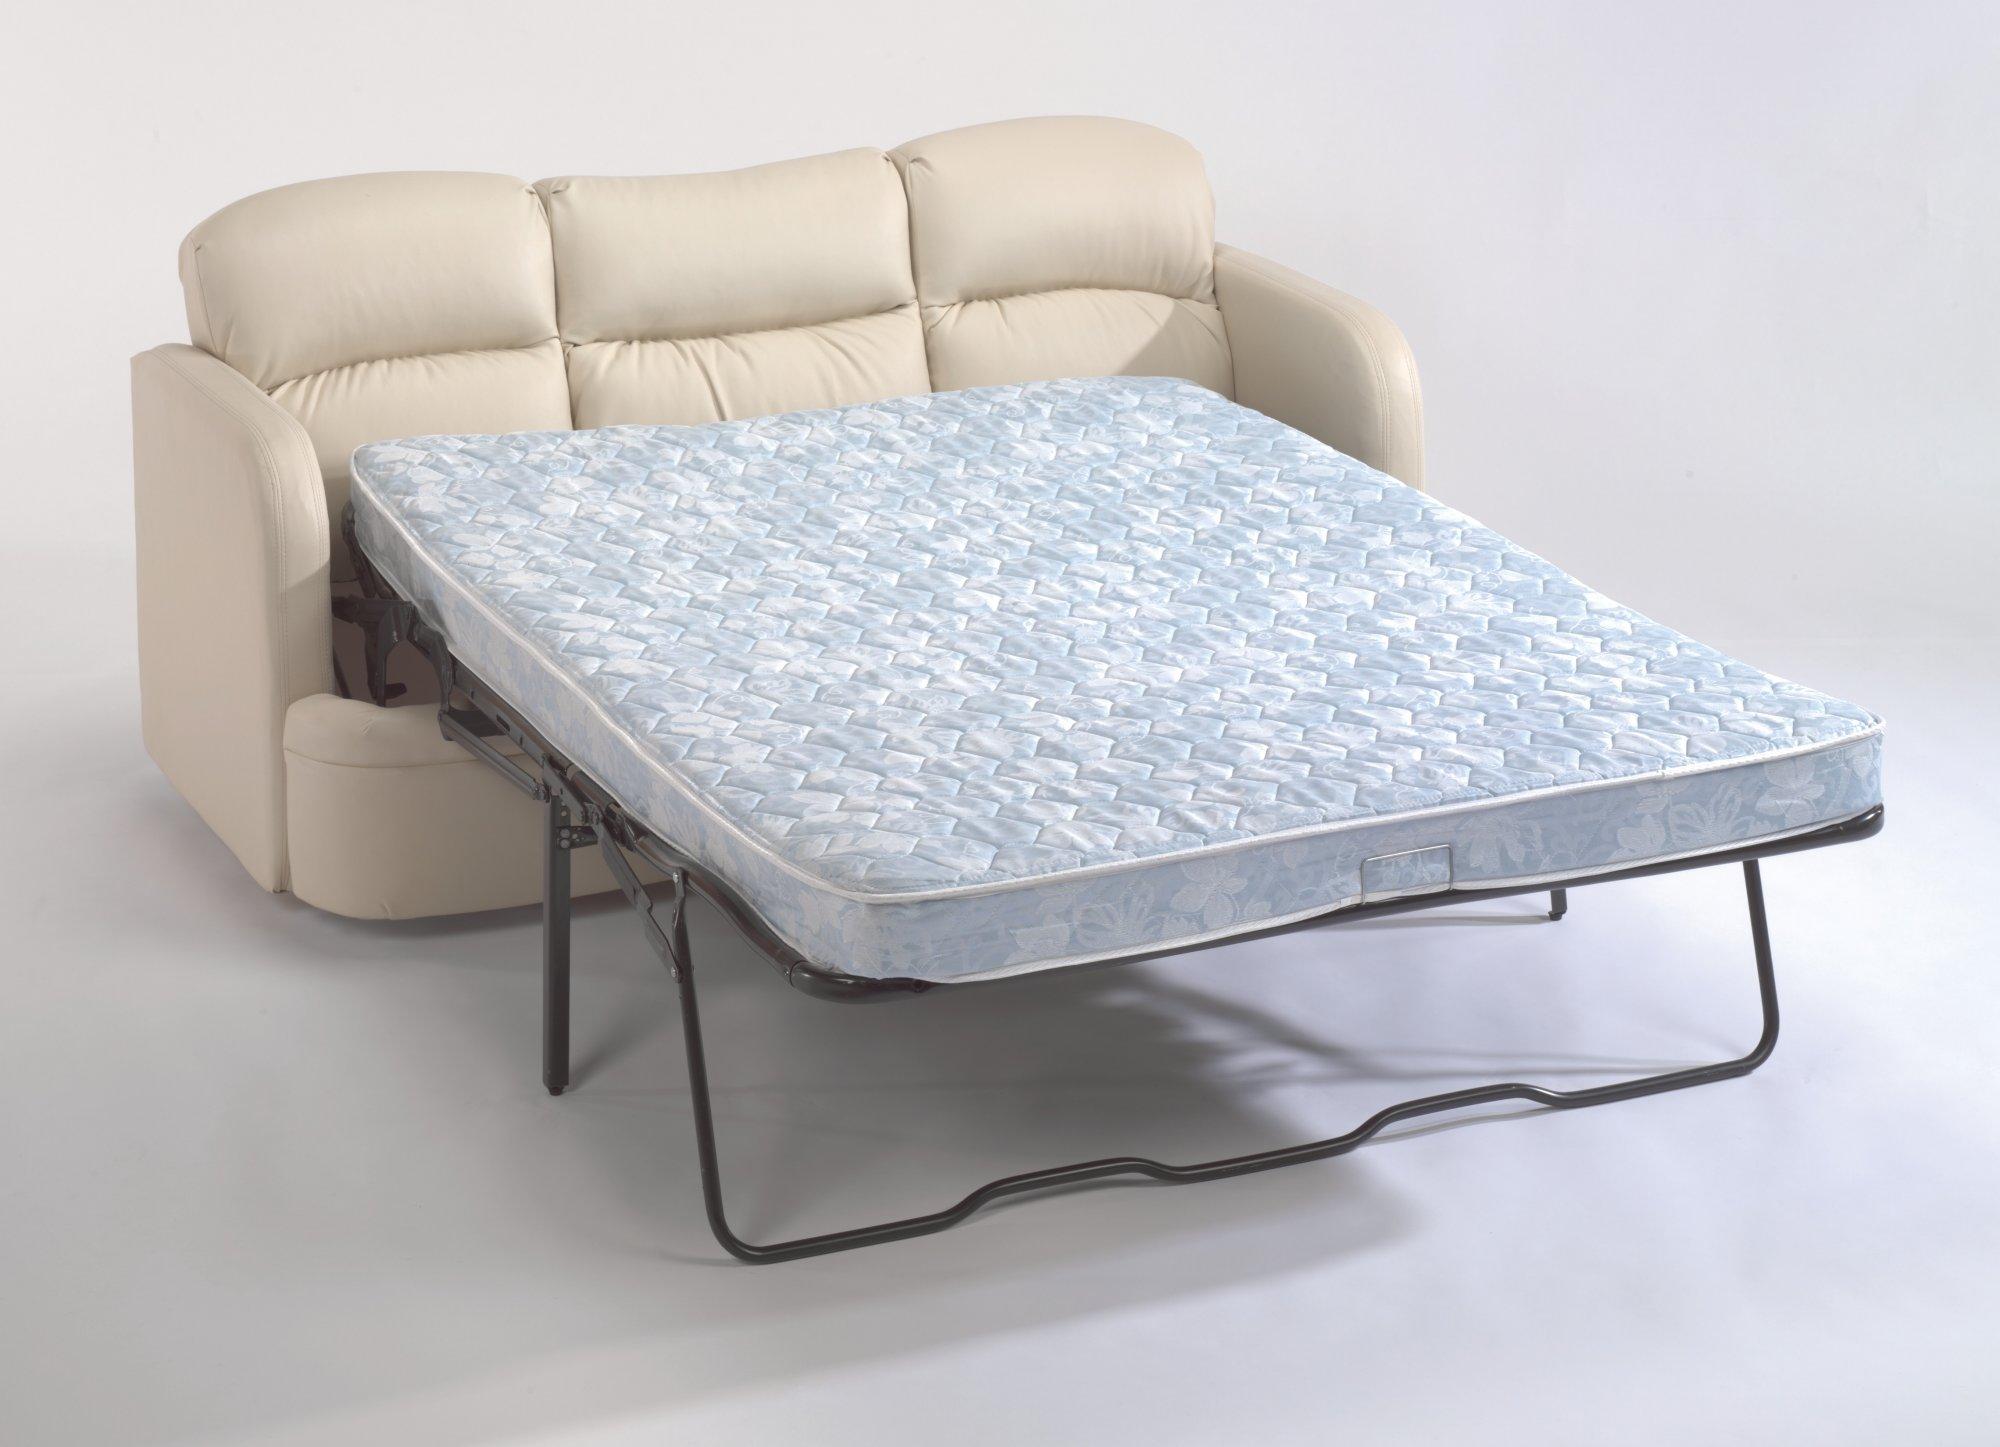 Bluestem Convertible Sofa Sleeper for Motor Homes - 67 in. W | Flexsteel